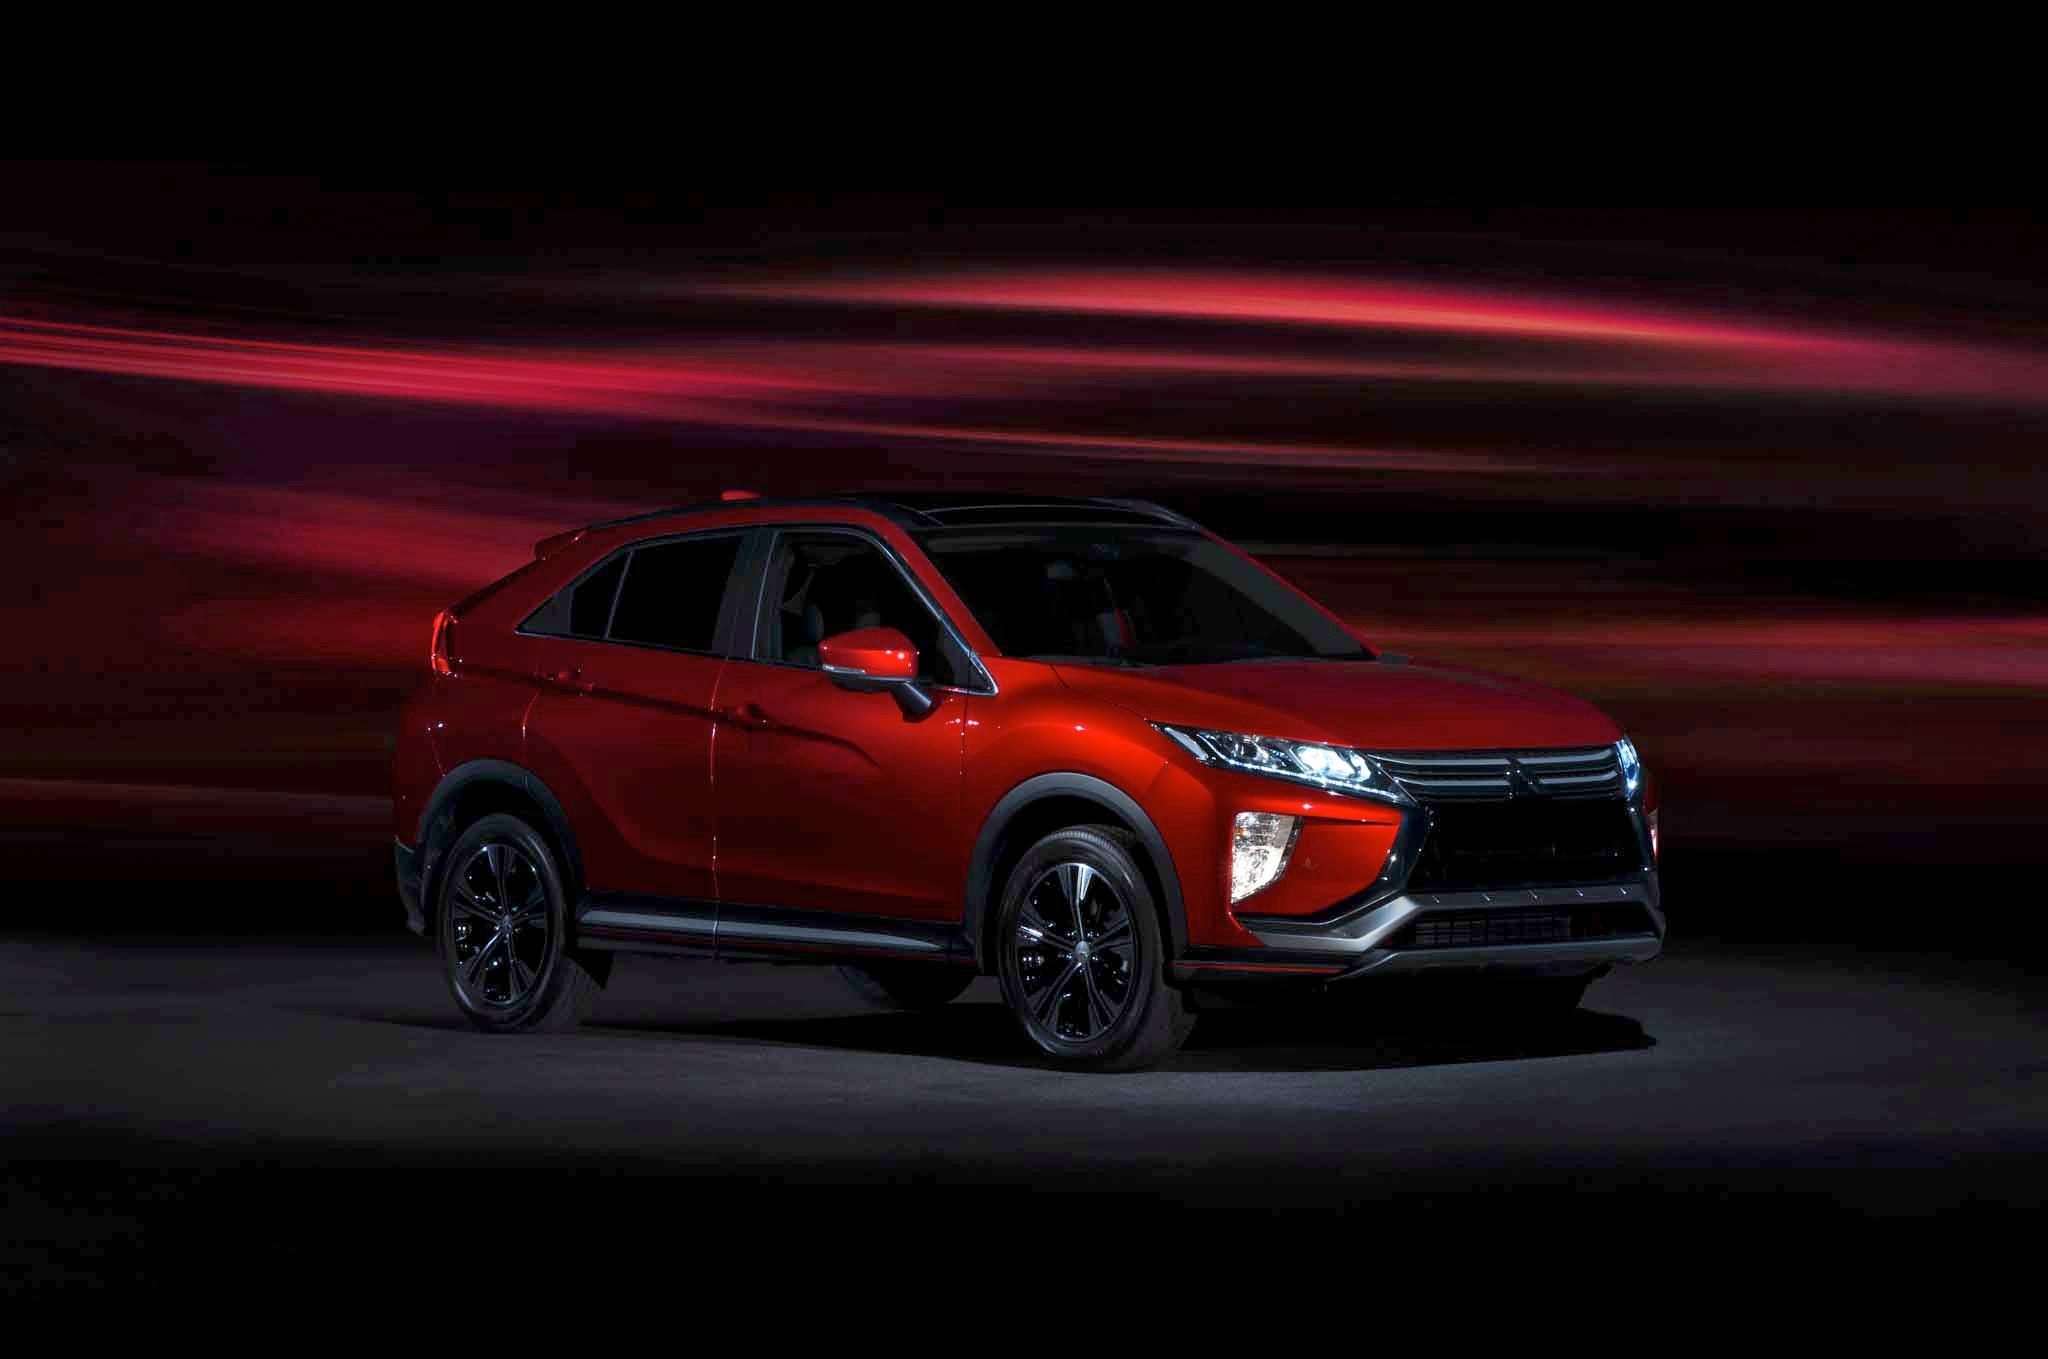 2018 Mitsubishi Eclipse Cross Front Three Quarters 02 1